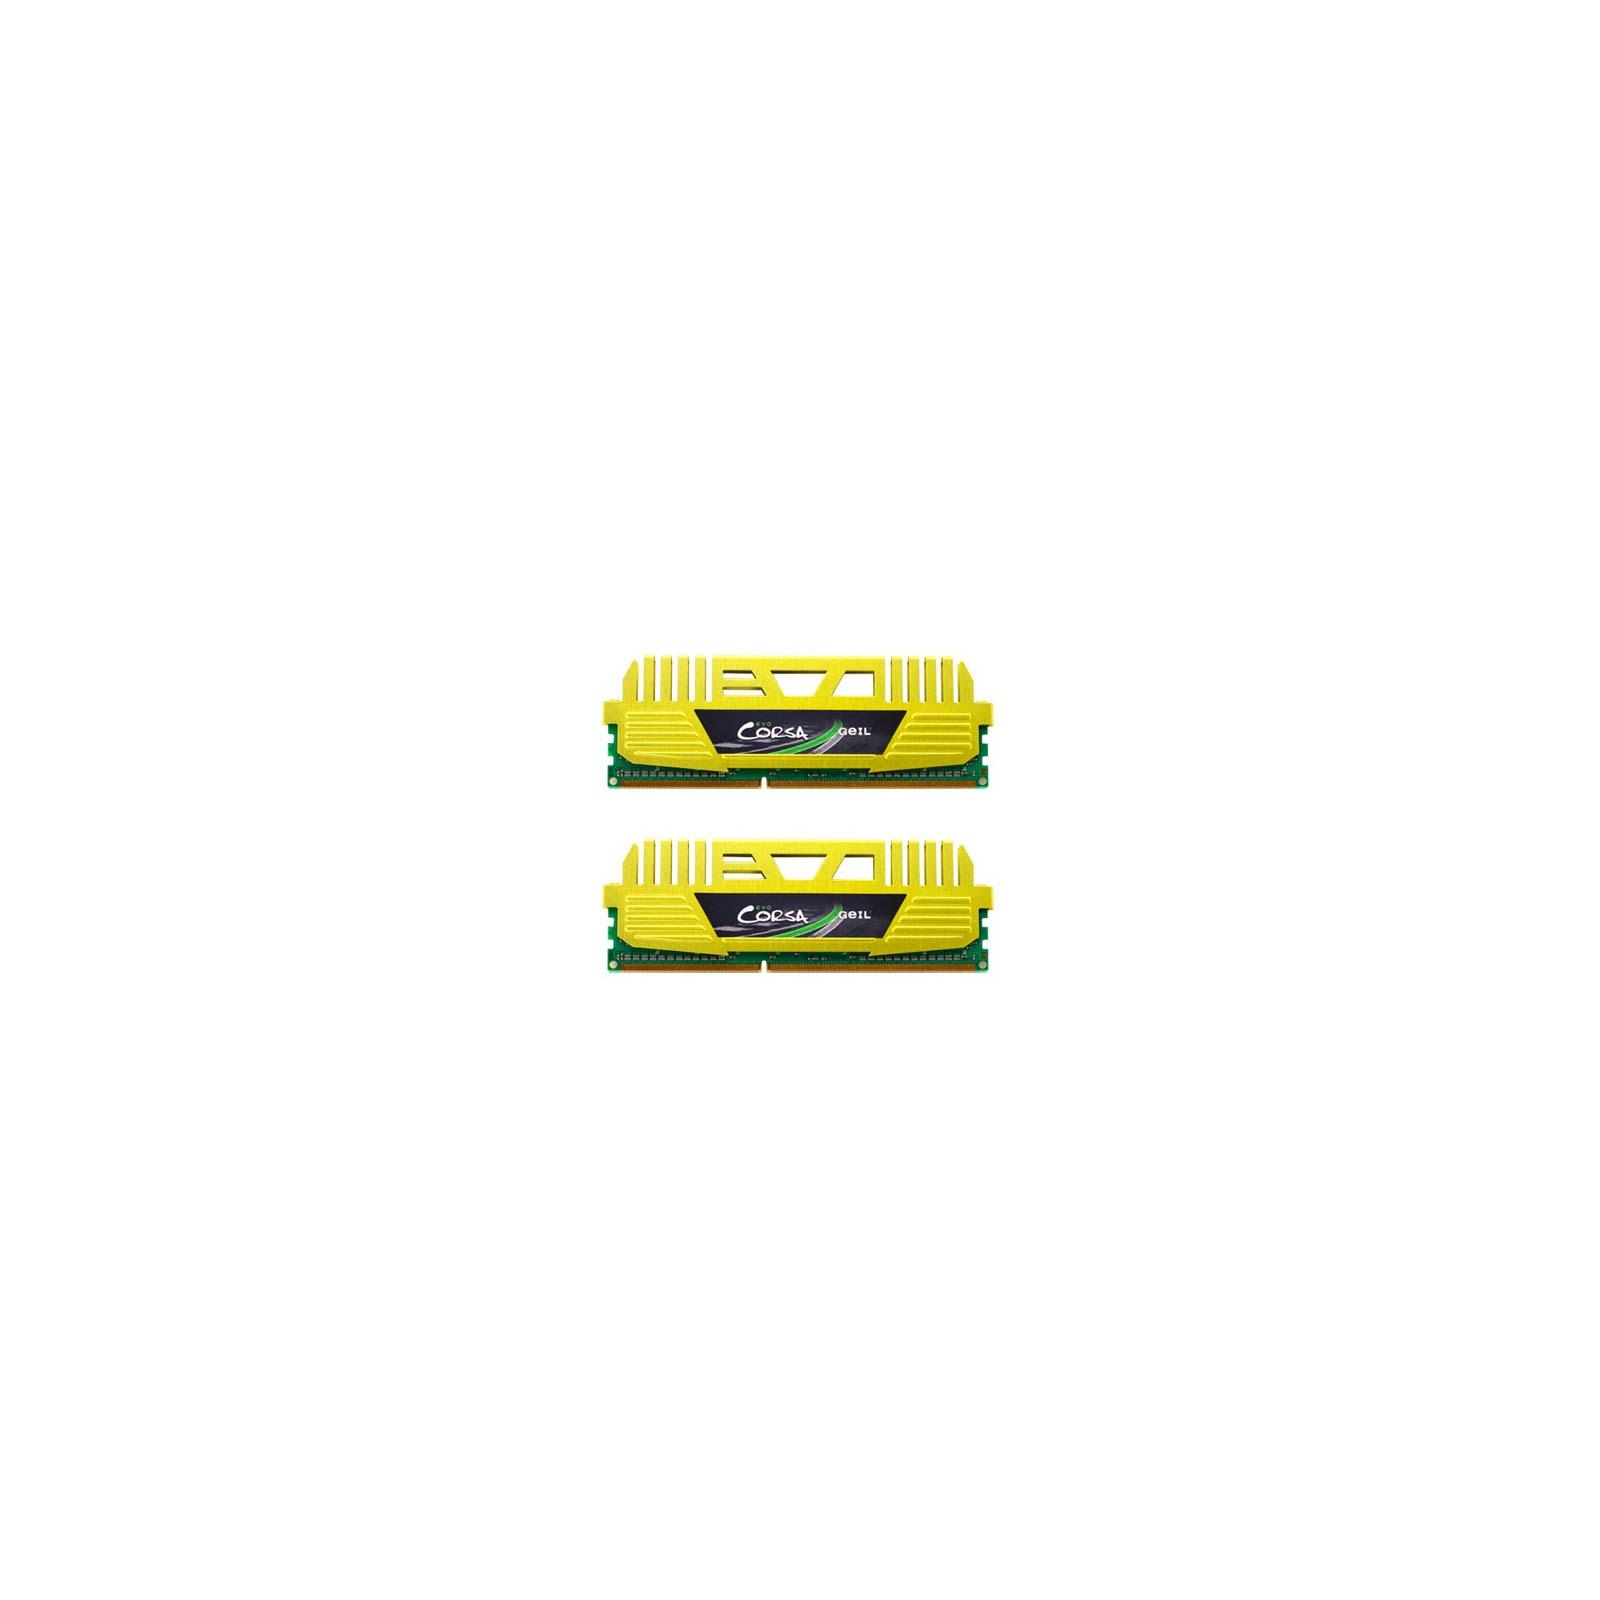 Модуль памяти для компьютера DDR3 4GB (2x2GB) 1866 MHz GEIL (GOC34GB1866C10DC)